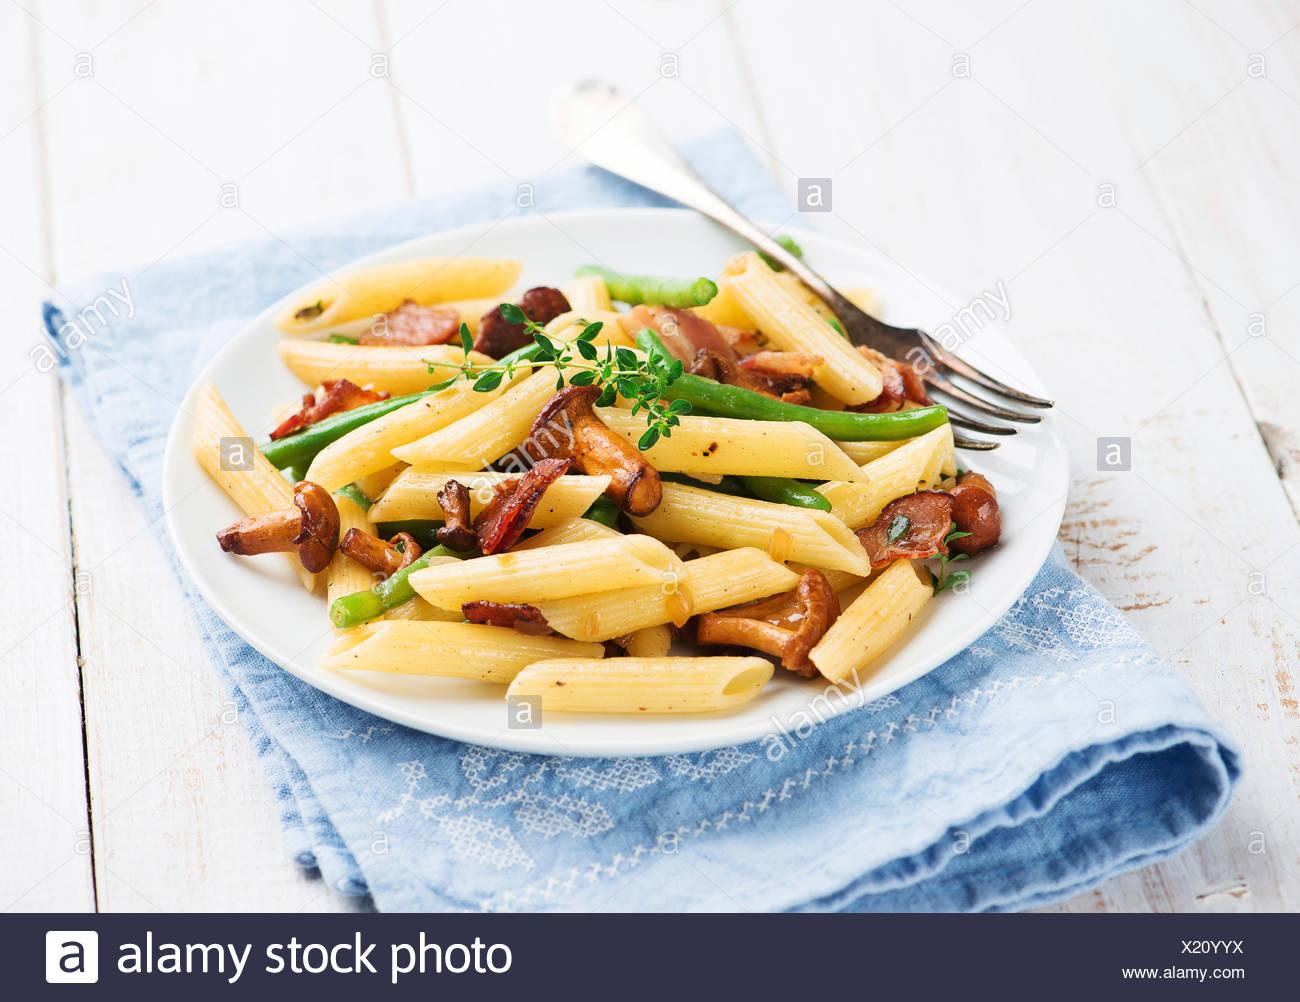 Pasta with chanterelles mushrooms - Stock Image